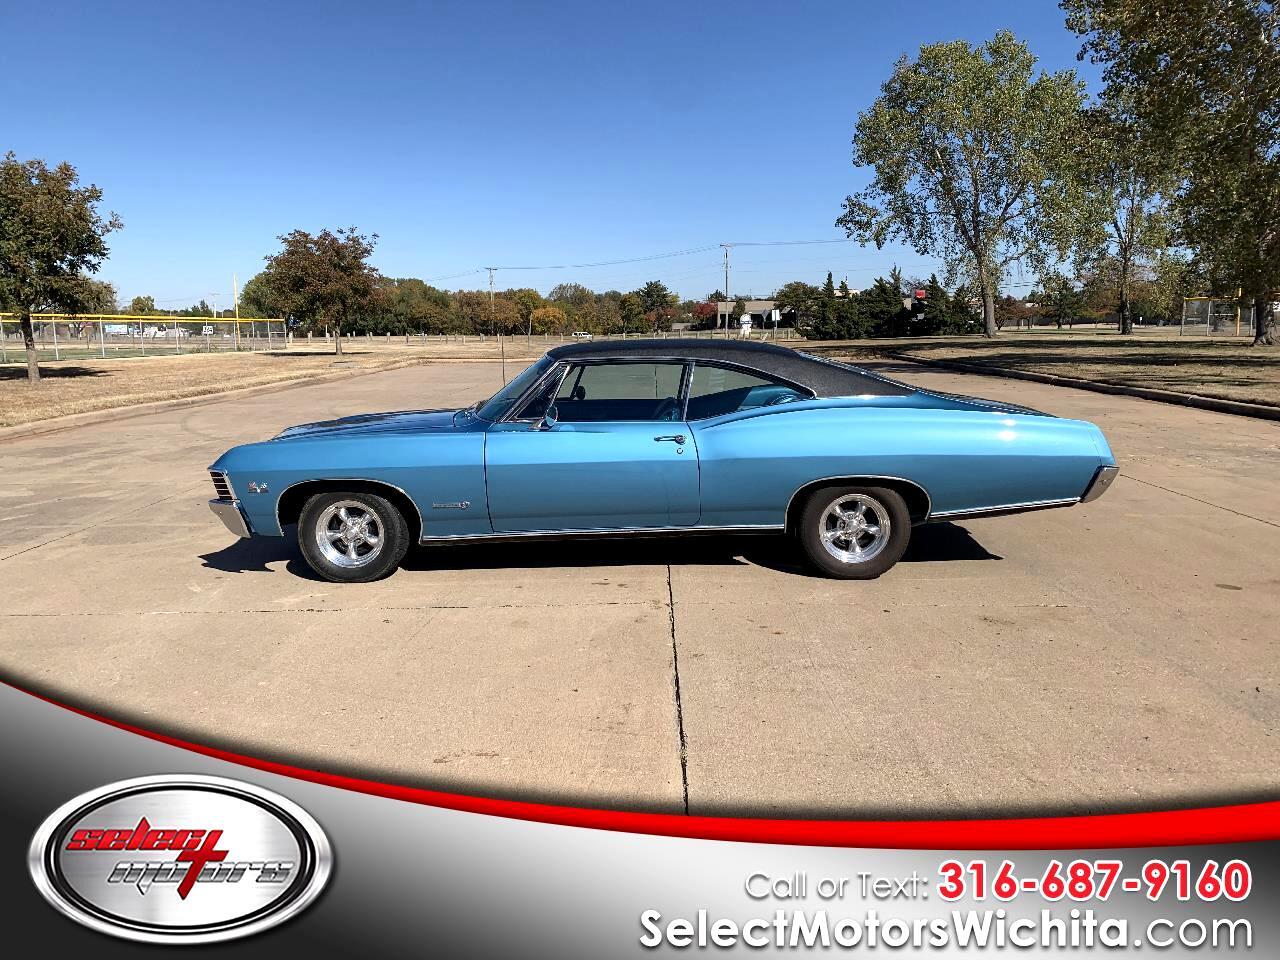 Chevrolet Impala SS Base 1967